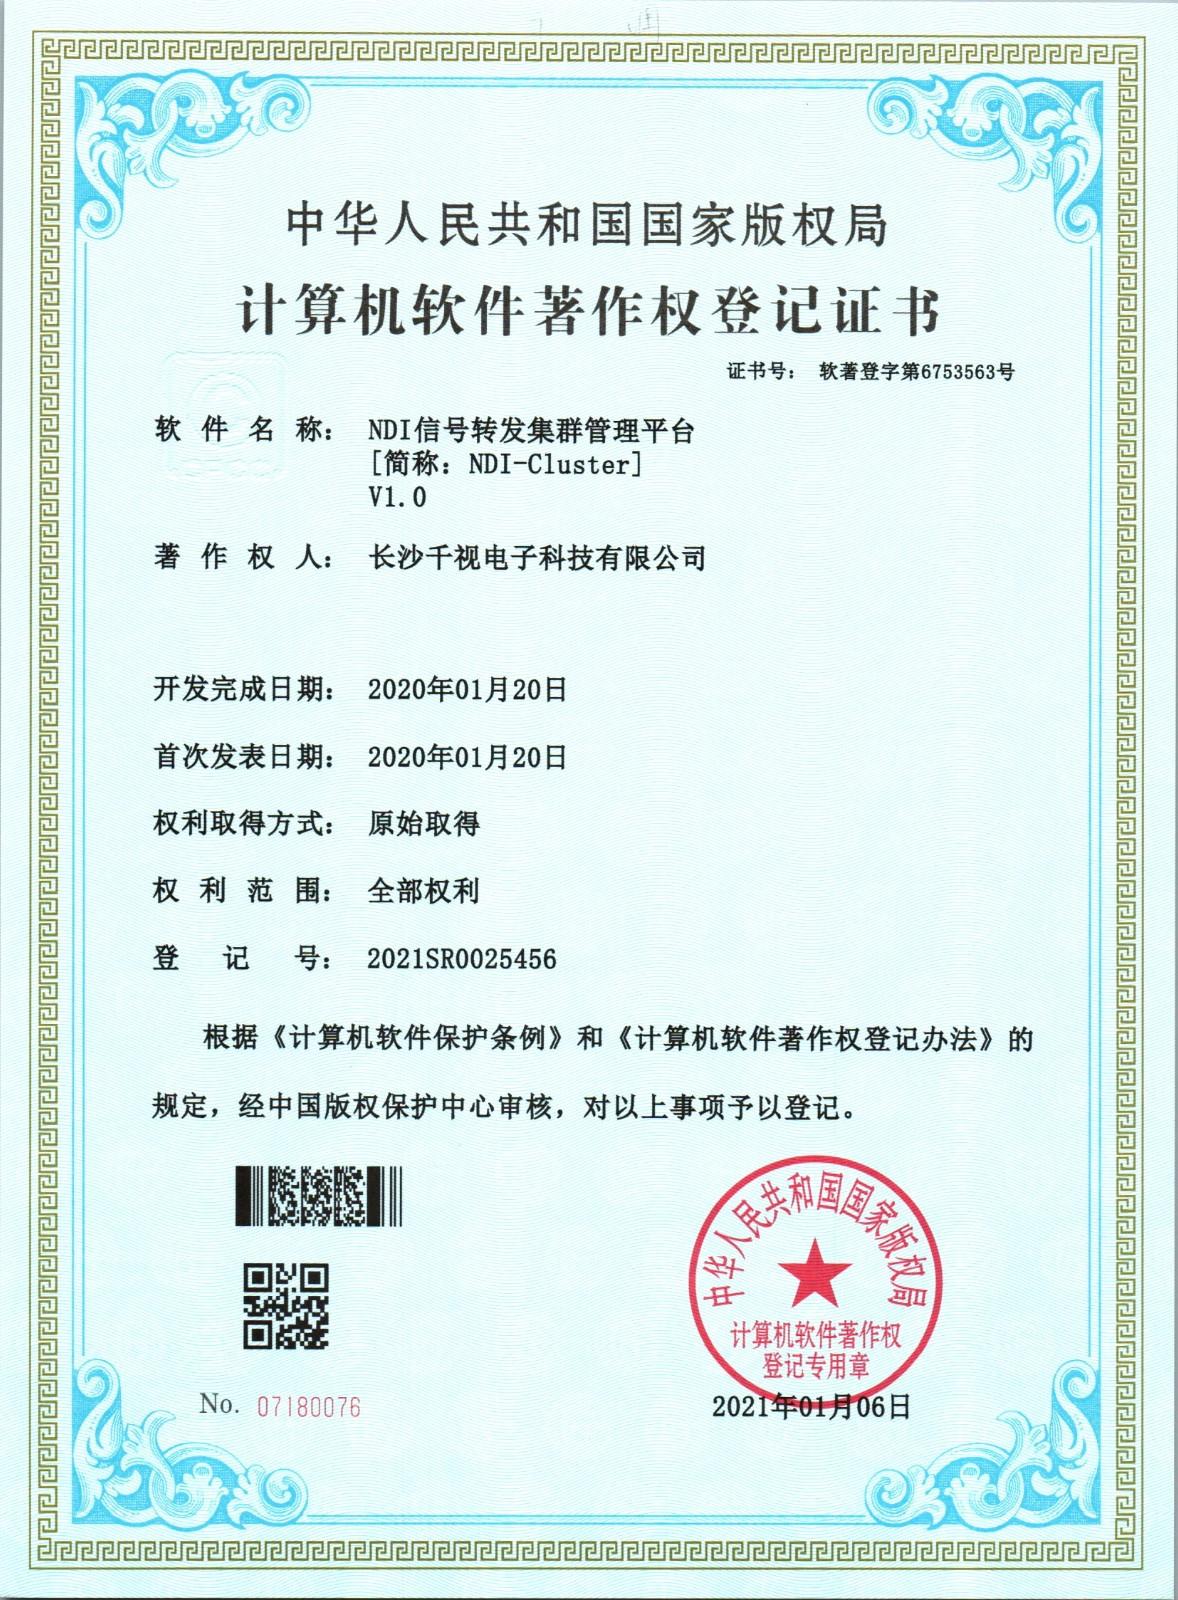 NDI集中管理软件证书